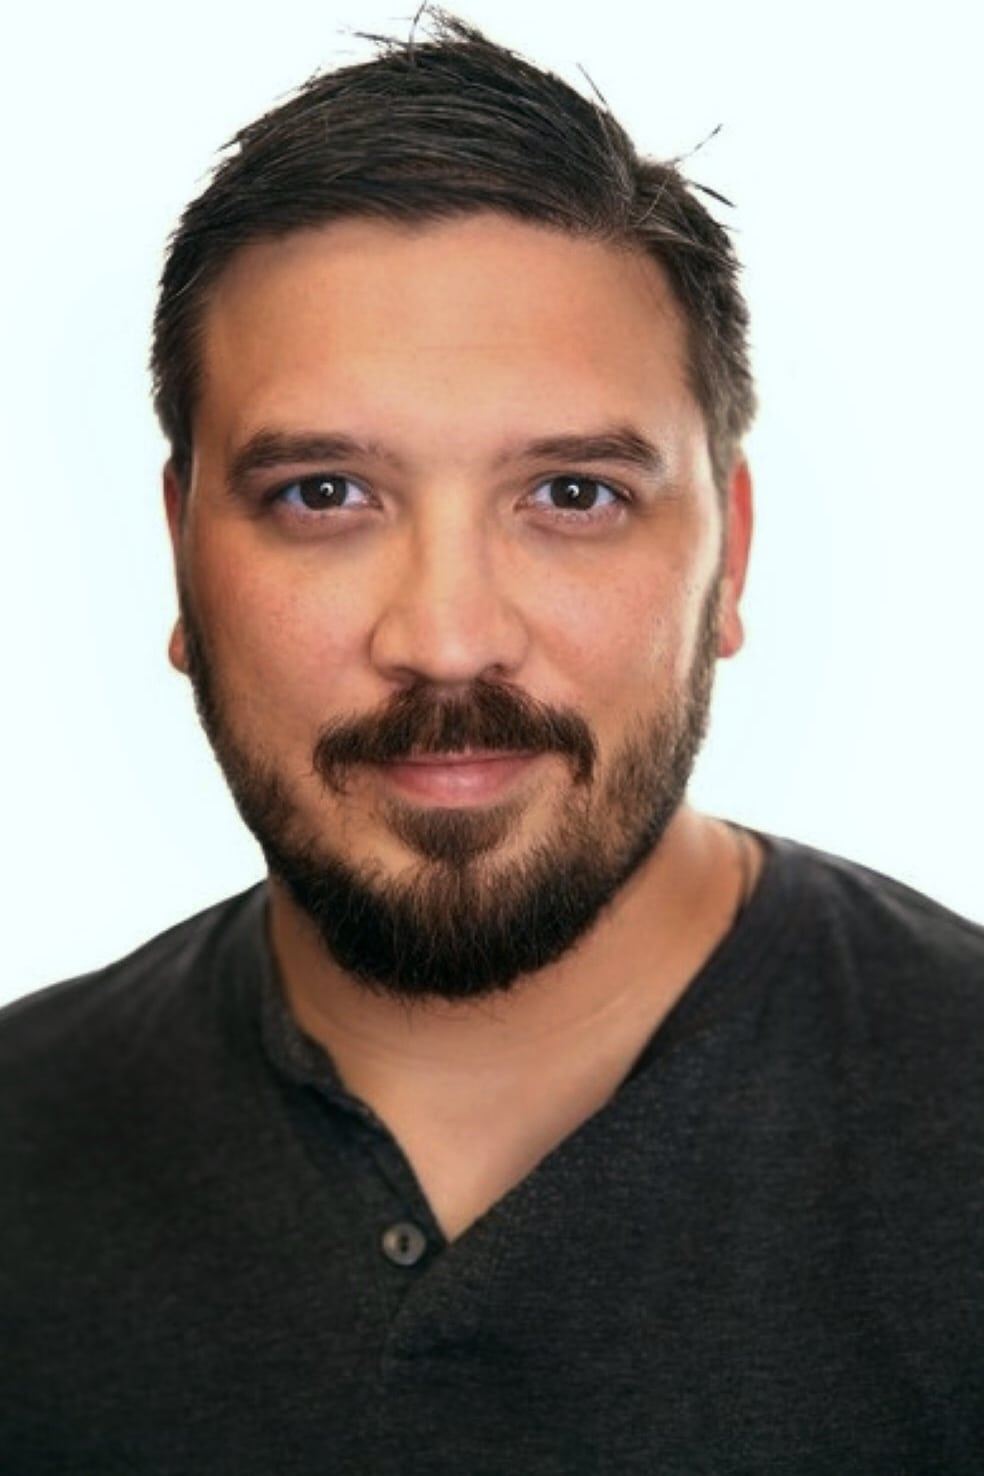 Adam Prickett